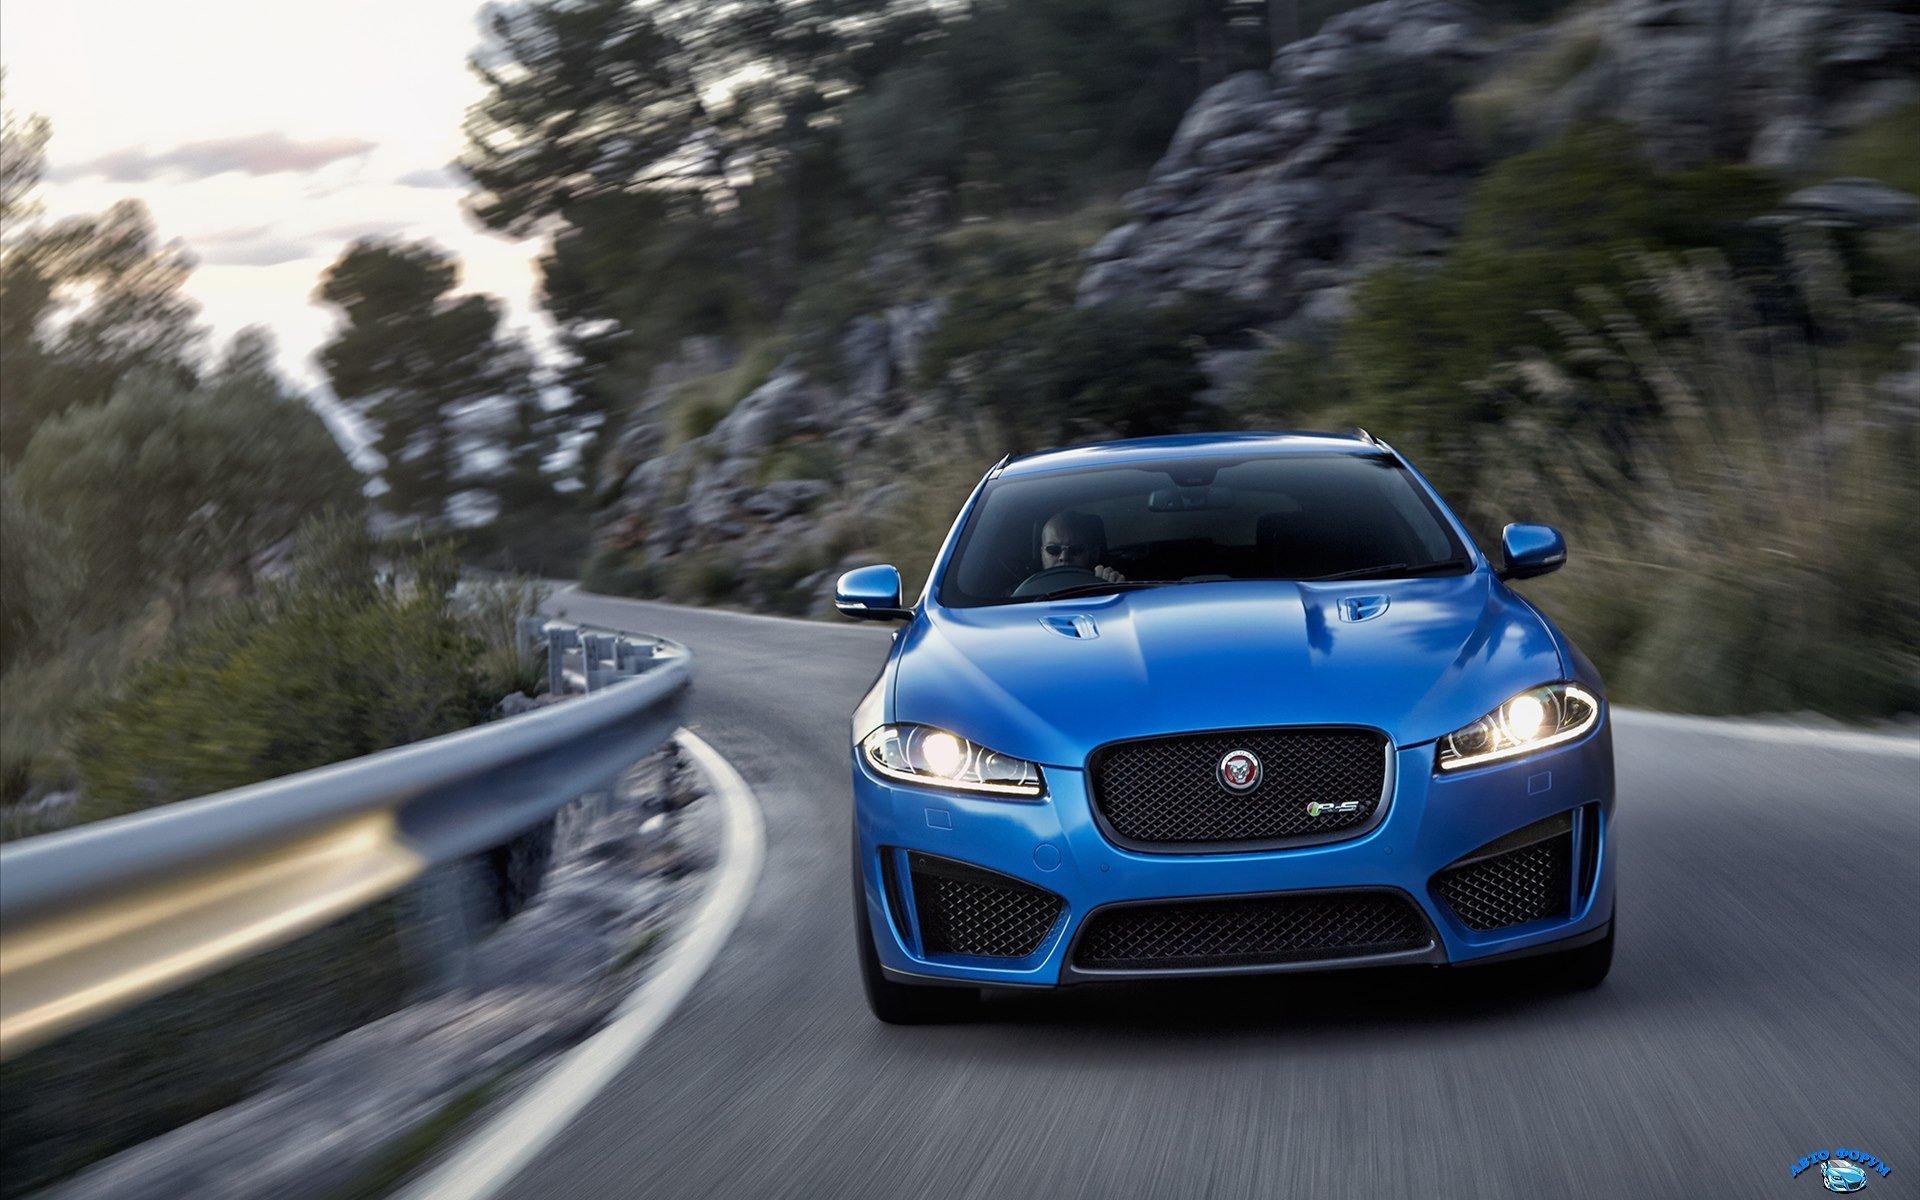 Jaguar-XFR-S-Sportbrake-2015-widescreen-17.jpg